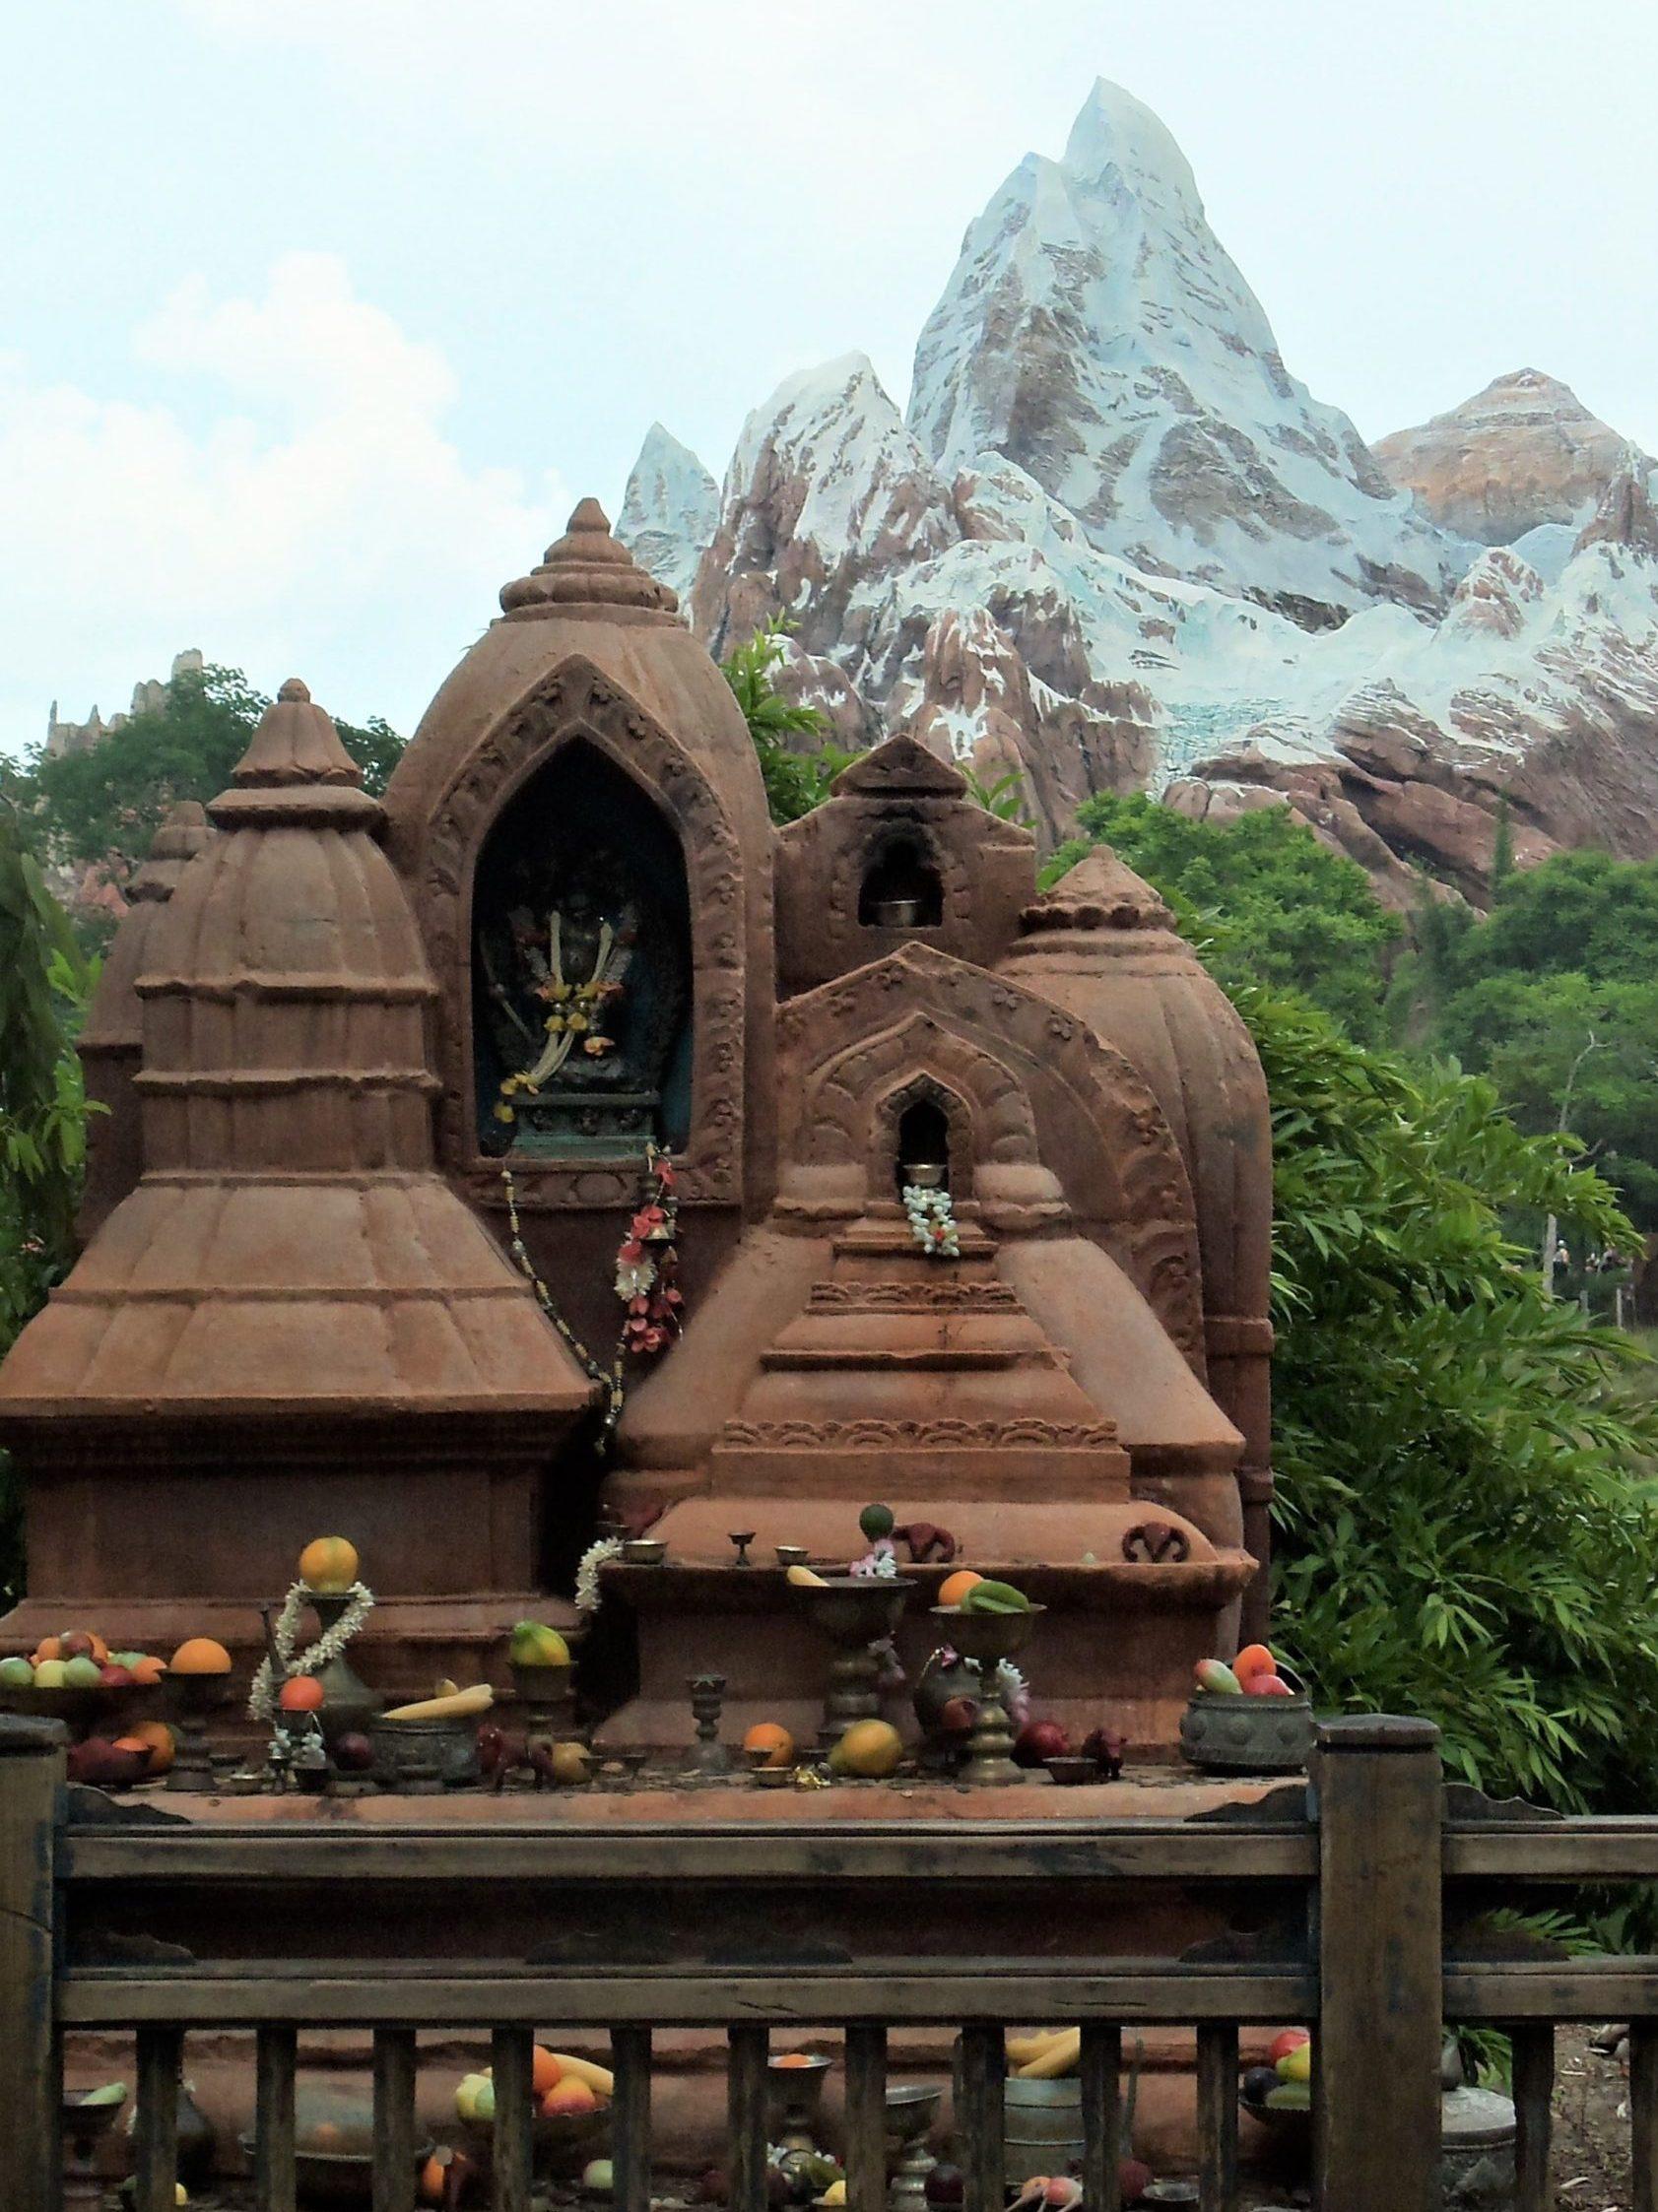 Everest mountain at magic kingdom